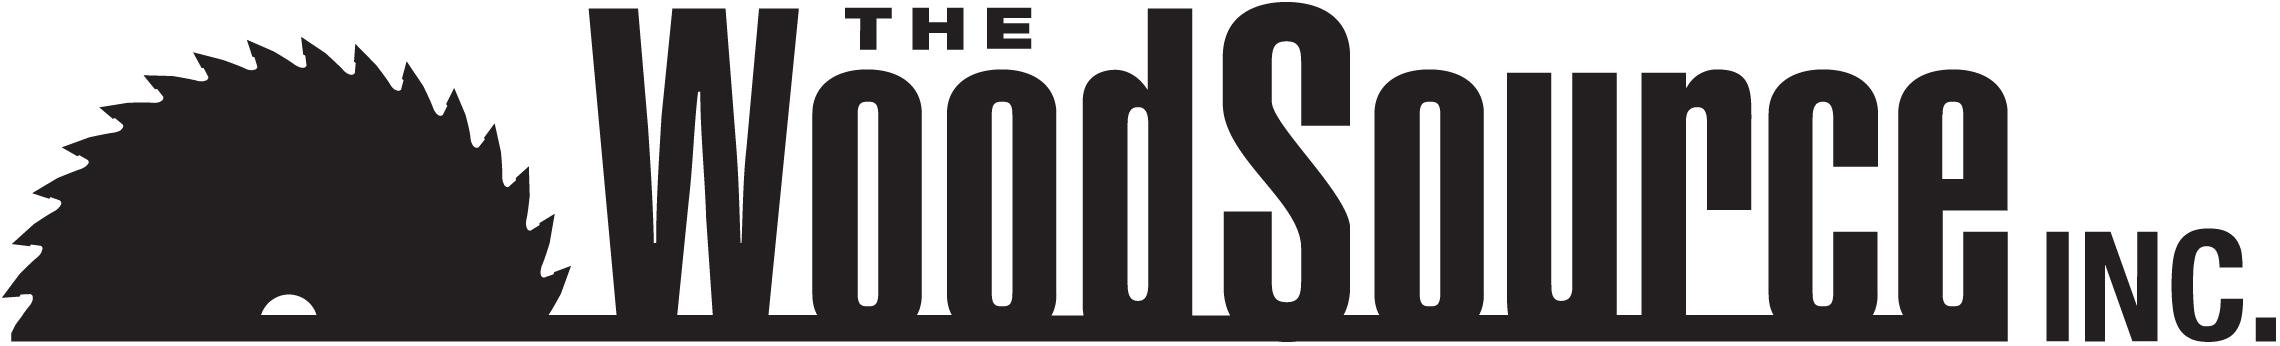 The Wood-Source Inc. - Sponsor